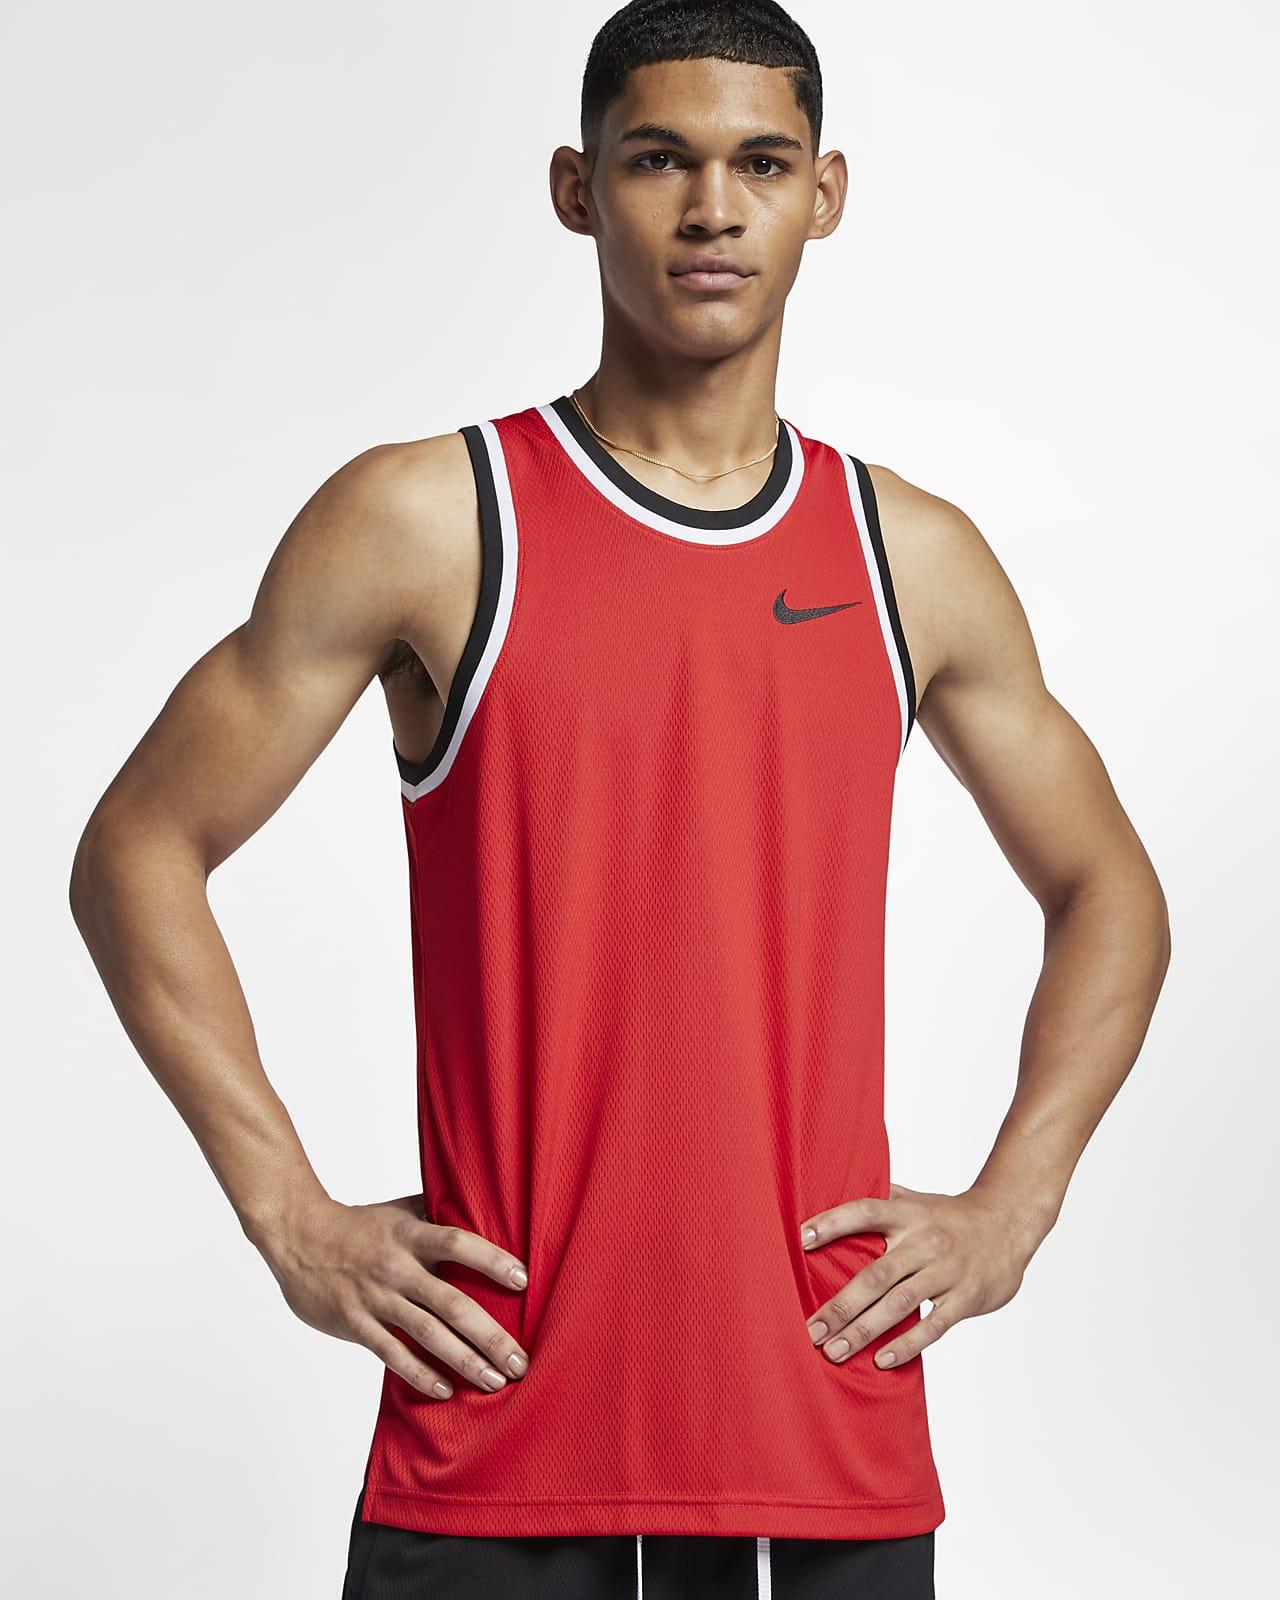 Nike Dri-FIT Classic Men's Basketball